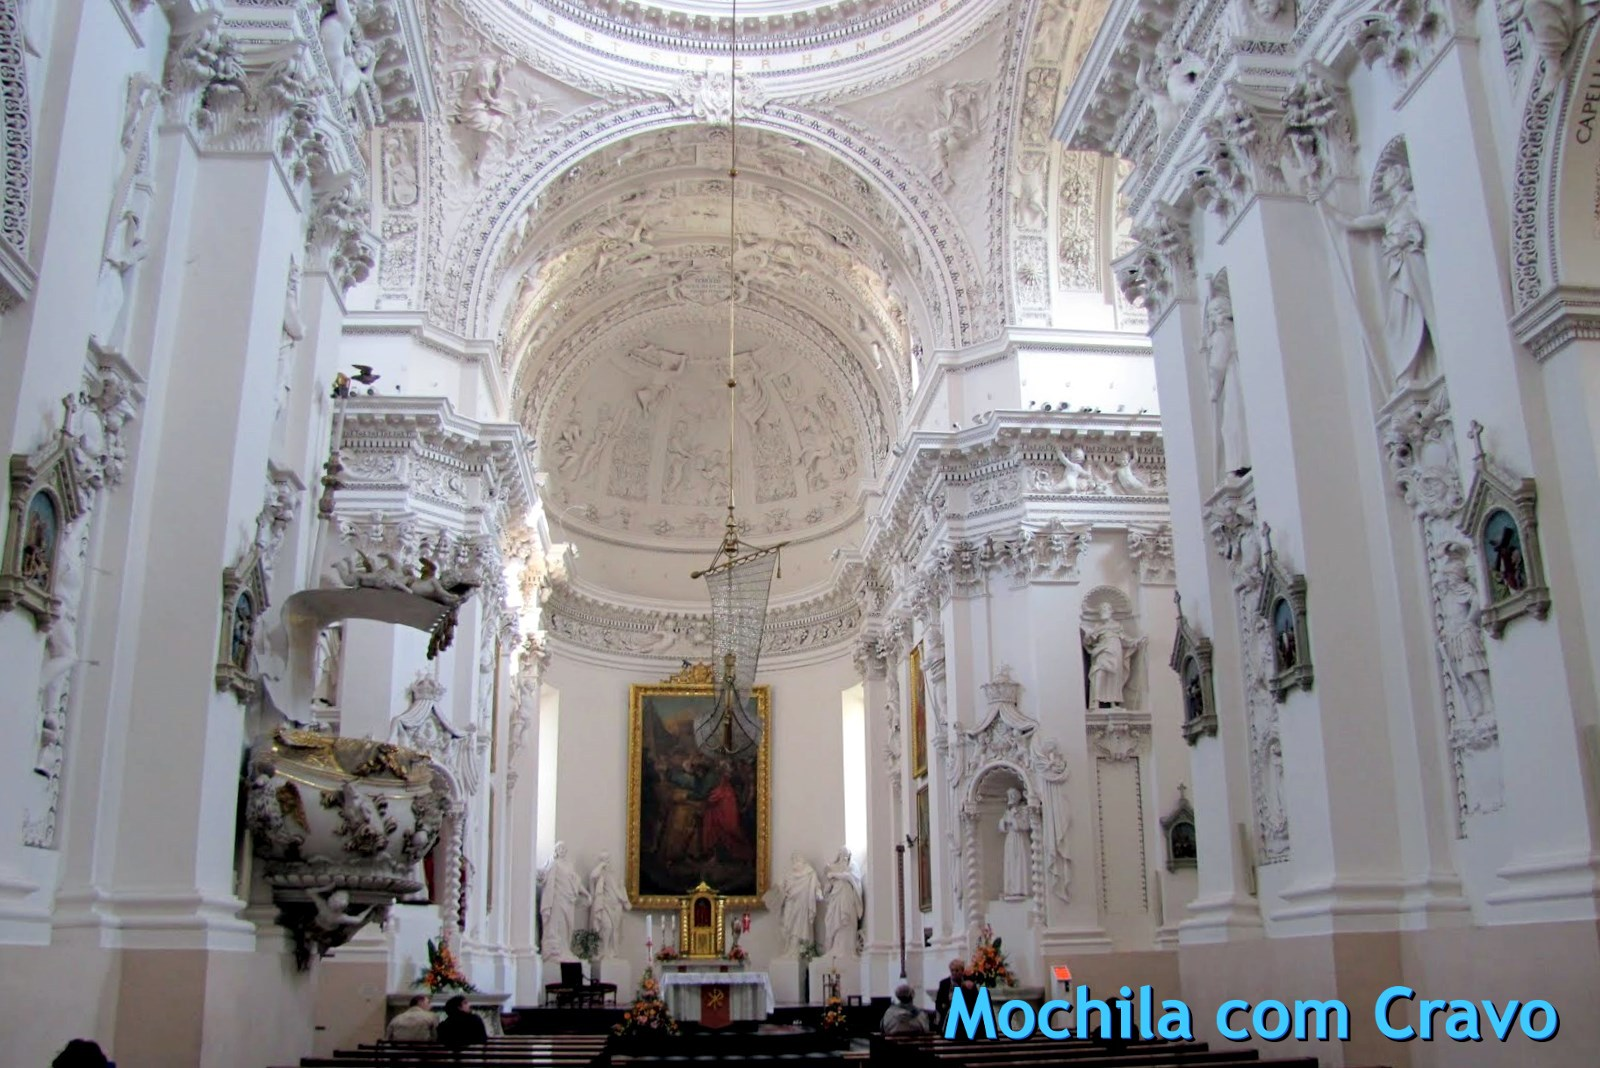 Igrejas pelo mundo IgrejaSaoPedroSaoPaulo